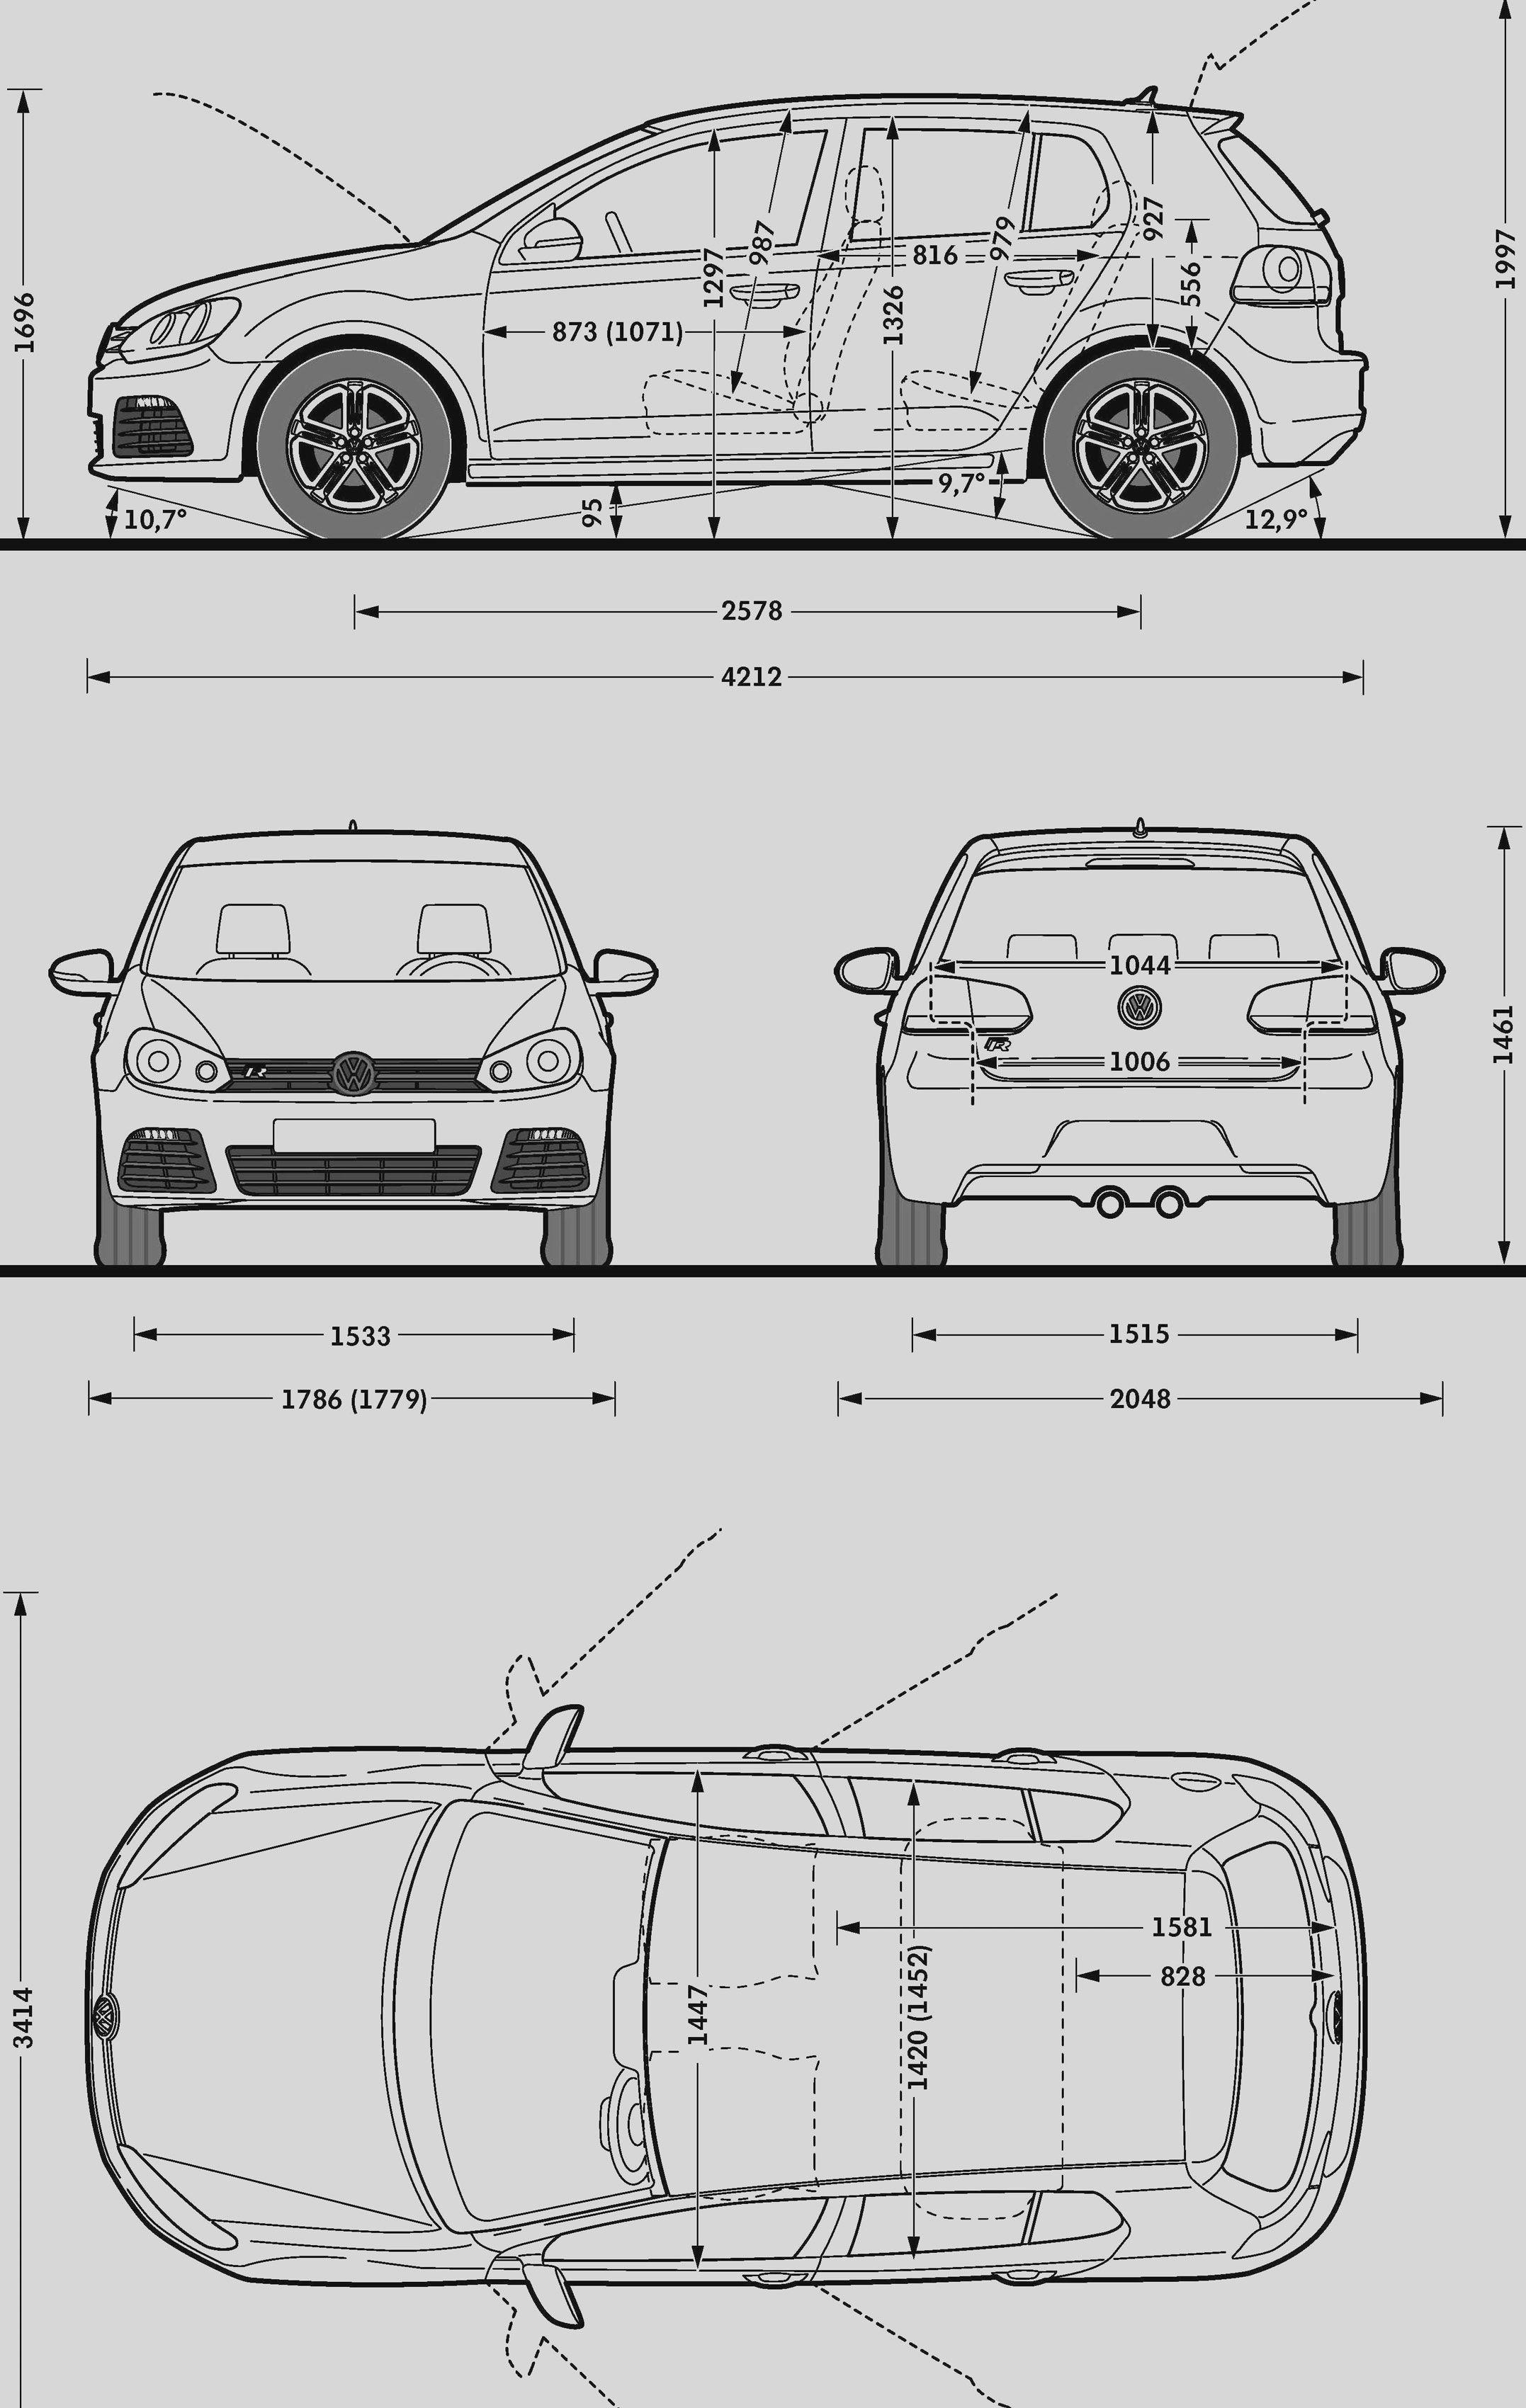 Vw Golf R Model Sheet